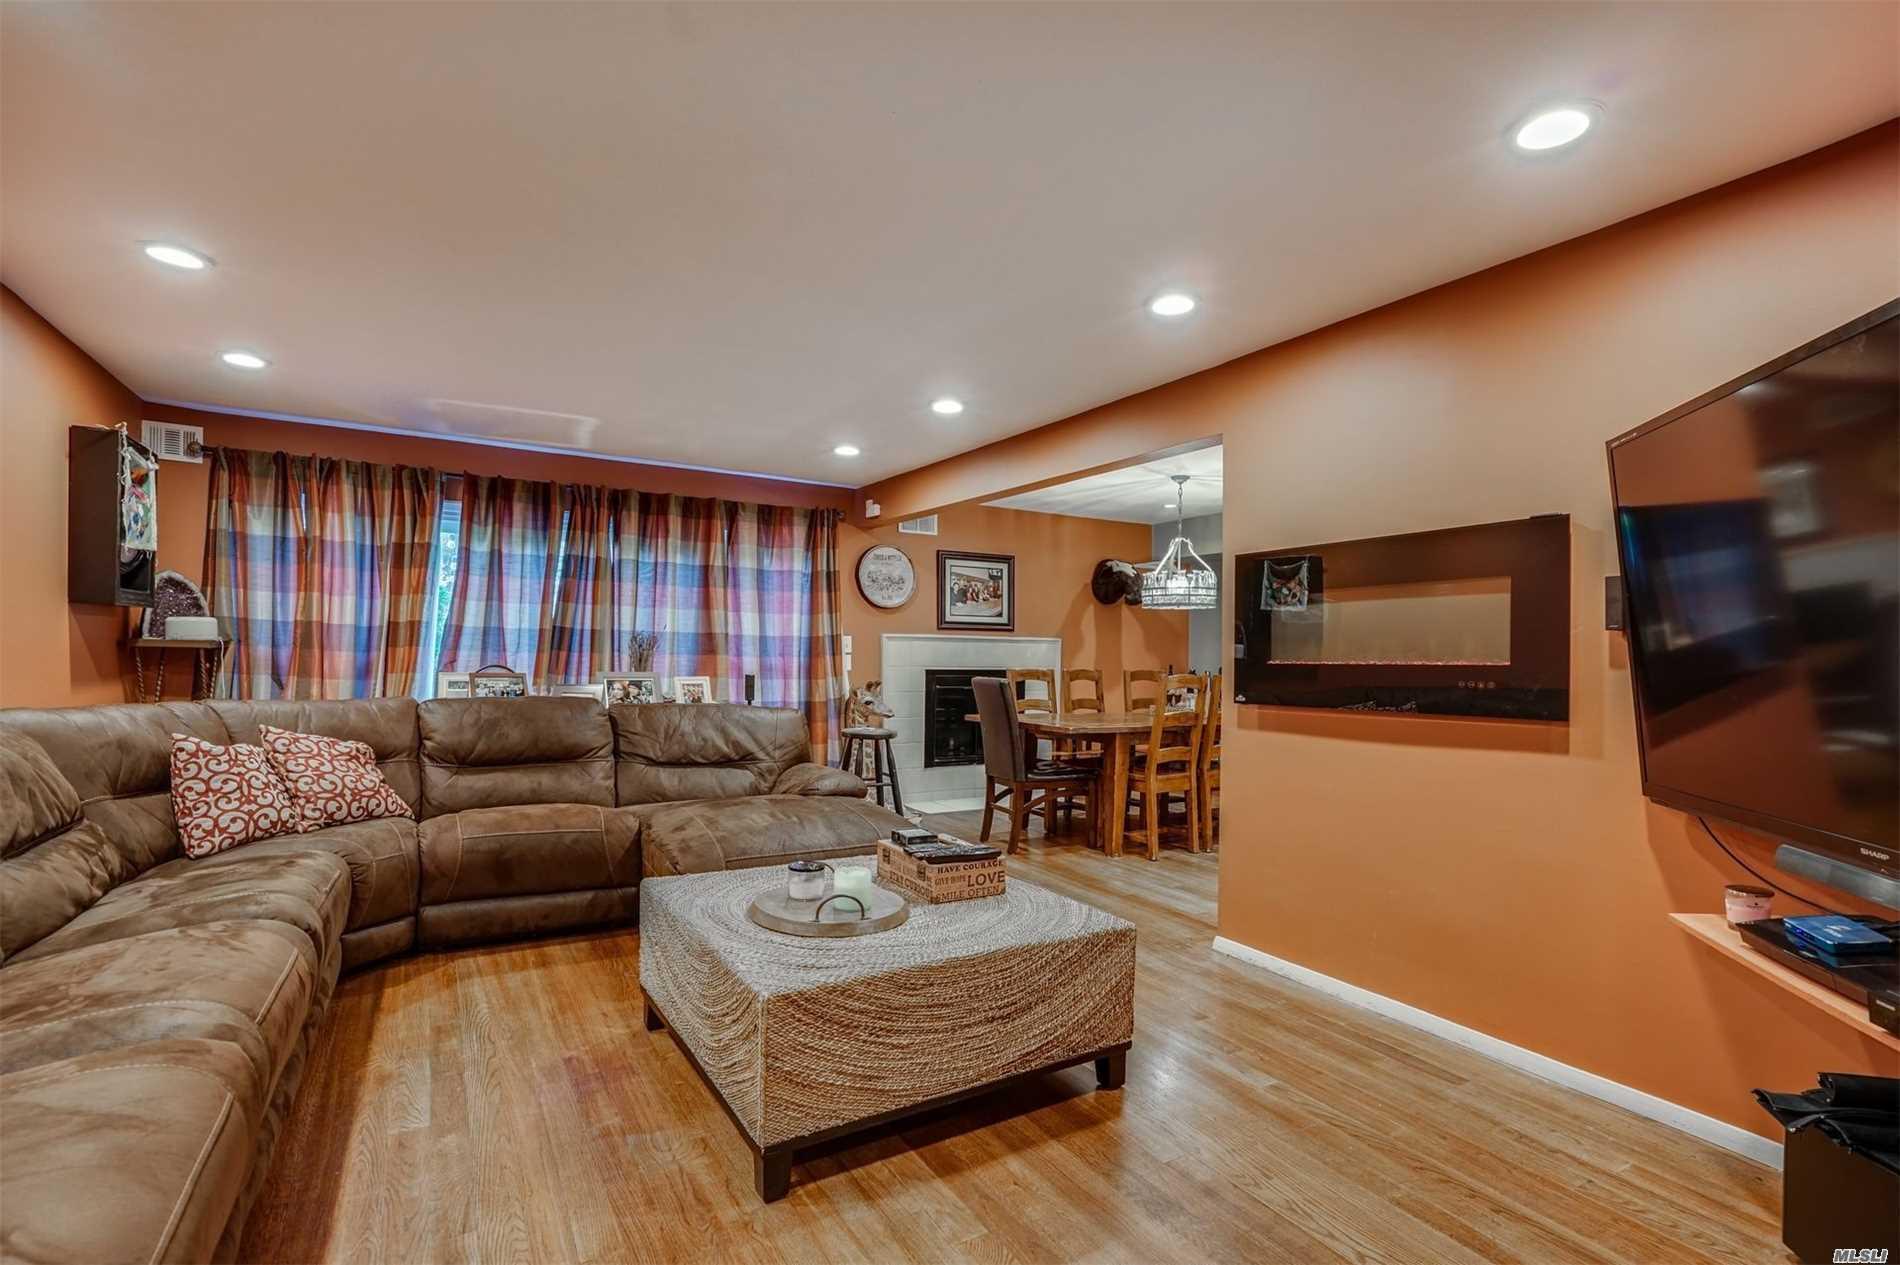 Property for sale at 31 Jennings Ln, Woodbury,  NY 11797